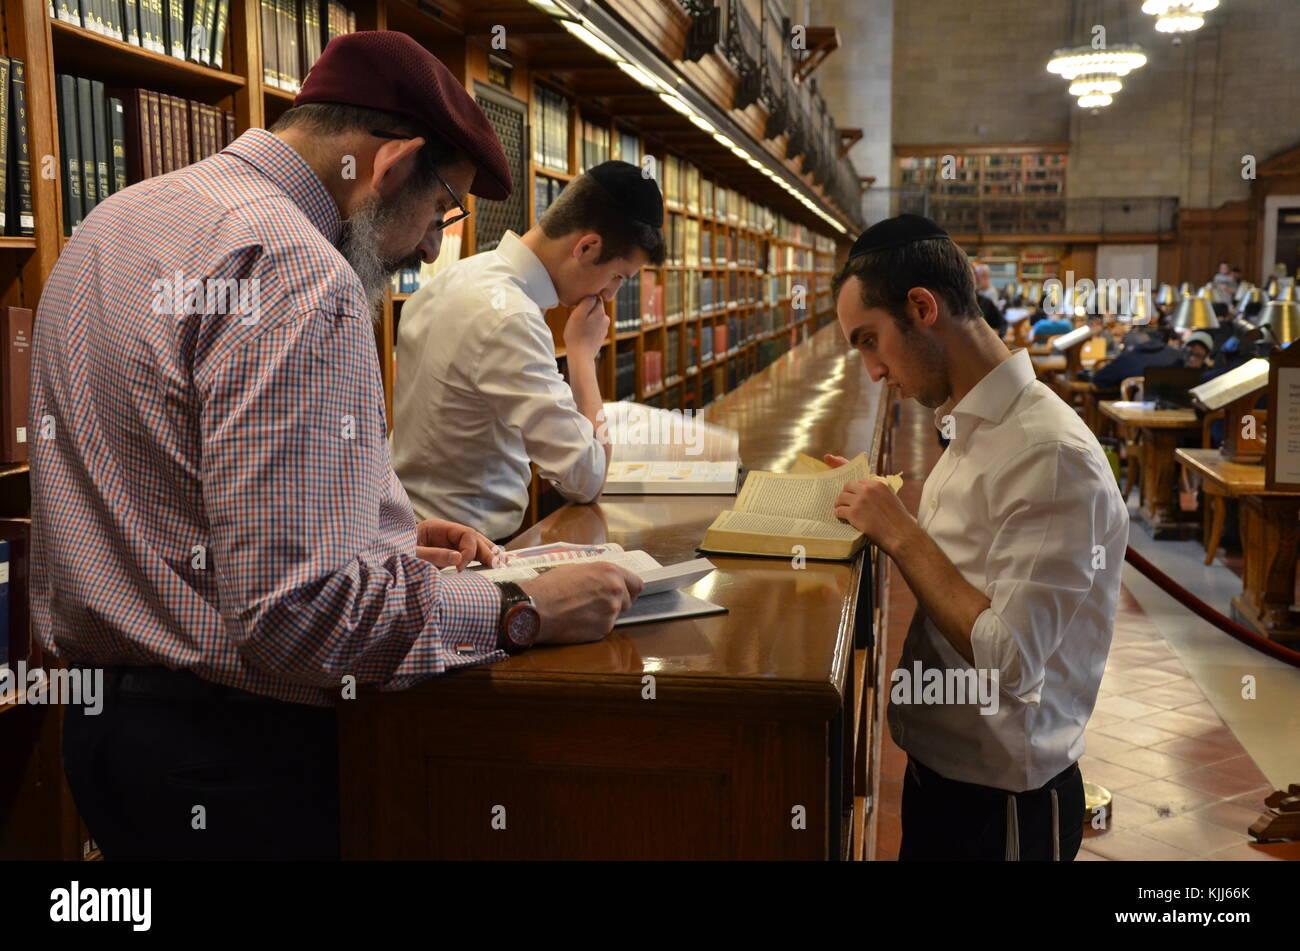 jewish library stock photos - photo #17